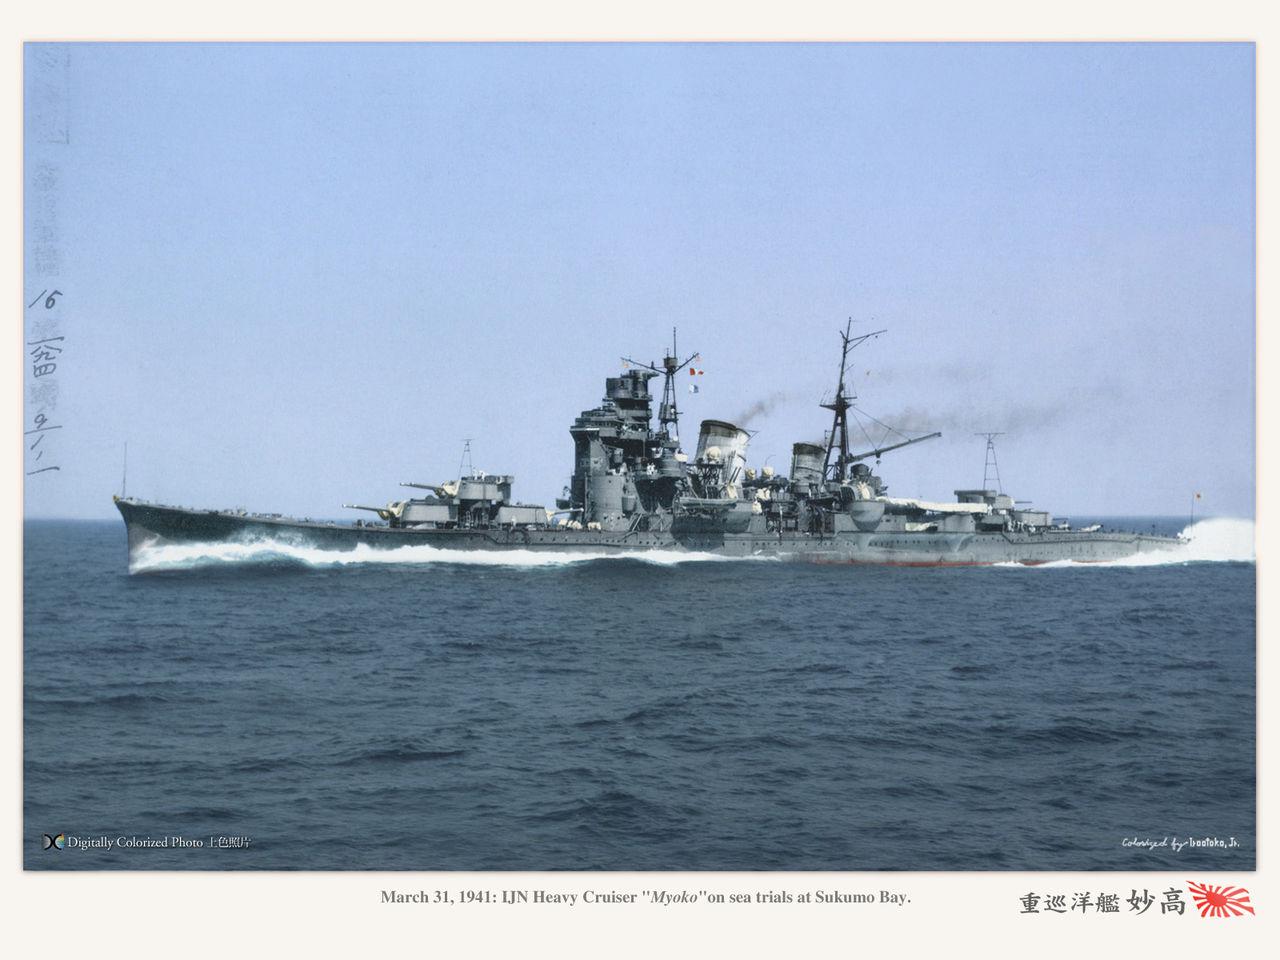 Myoko in post-reft sea trials, 1941, colorized